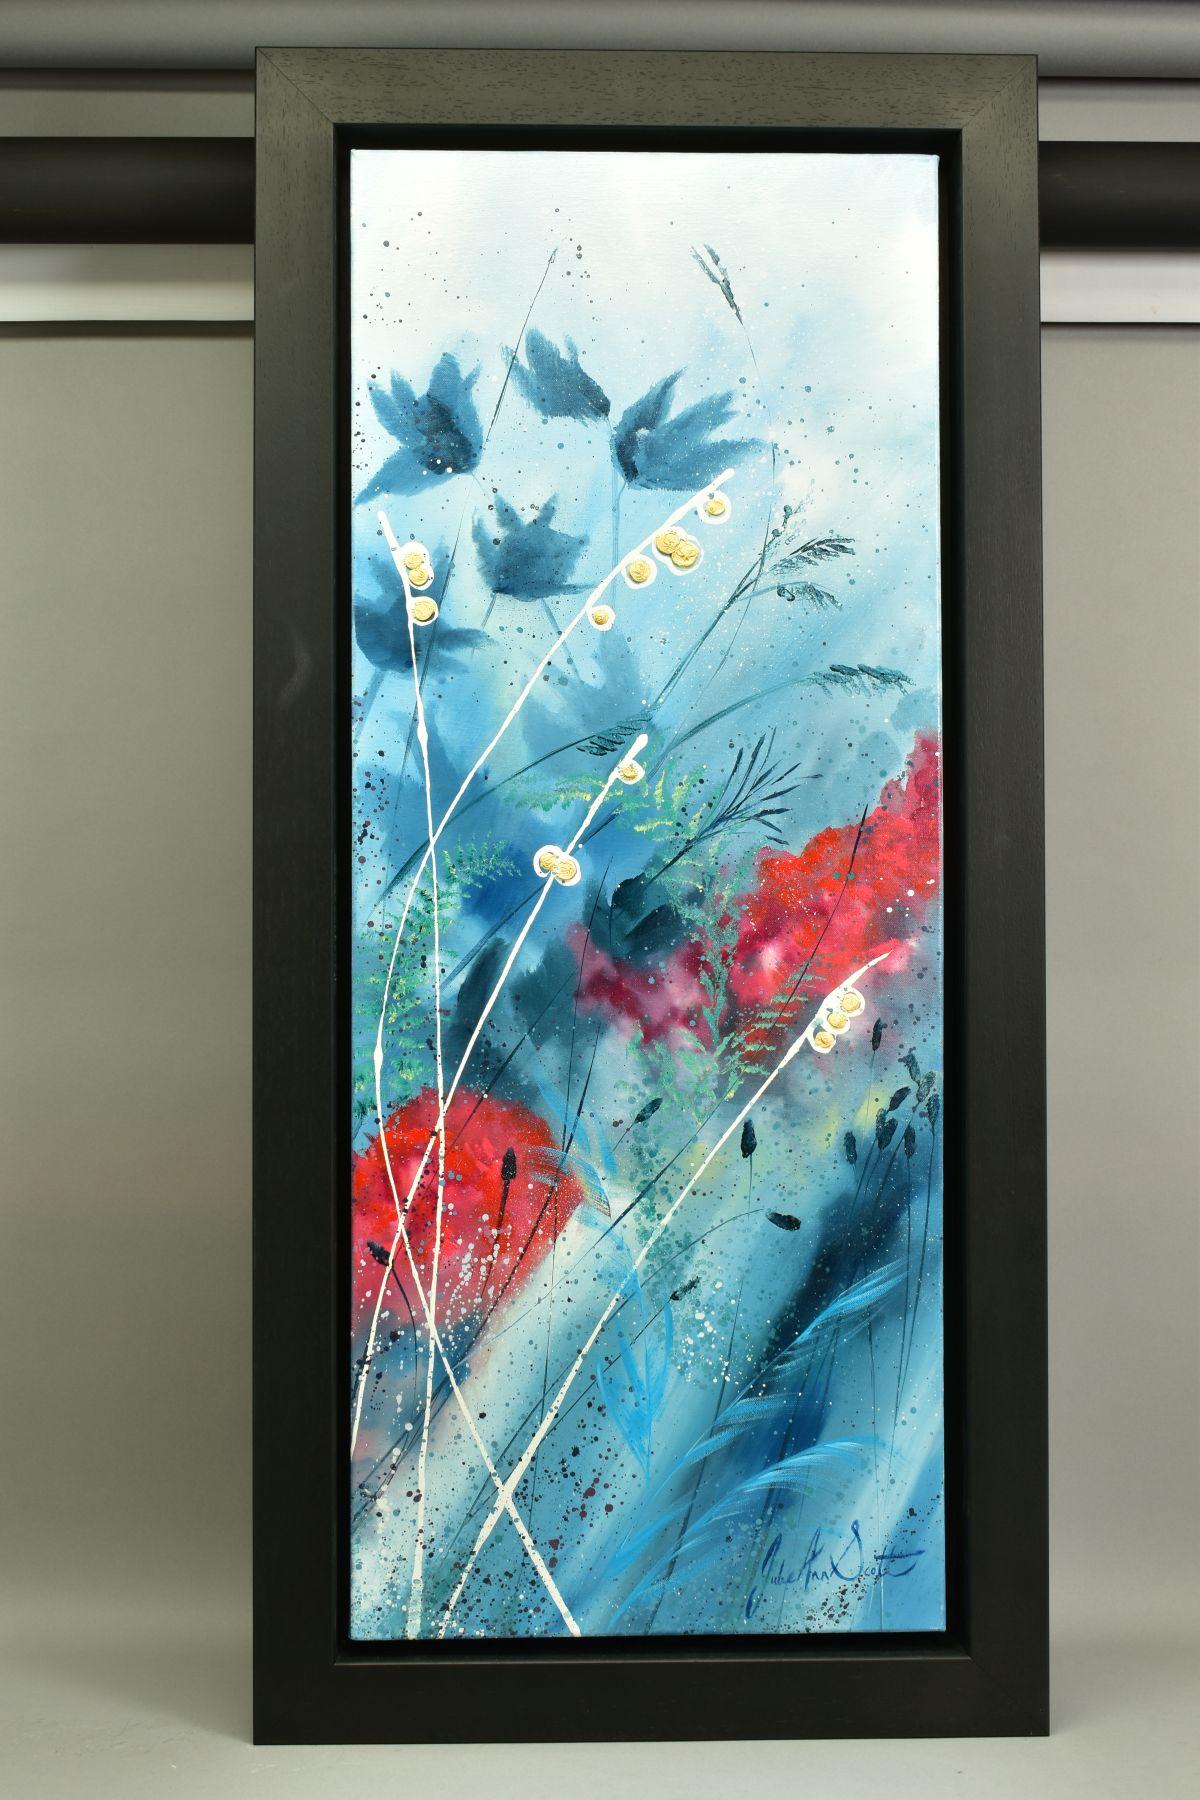 JULIE ANN SCOTT (BRITISH CONTEMPORARY), 'Home Spun Joy', wild flowers against a blue backdrop,